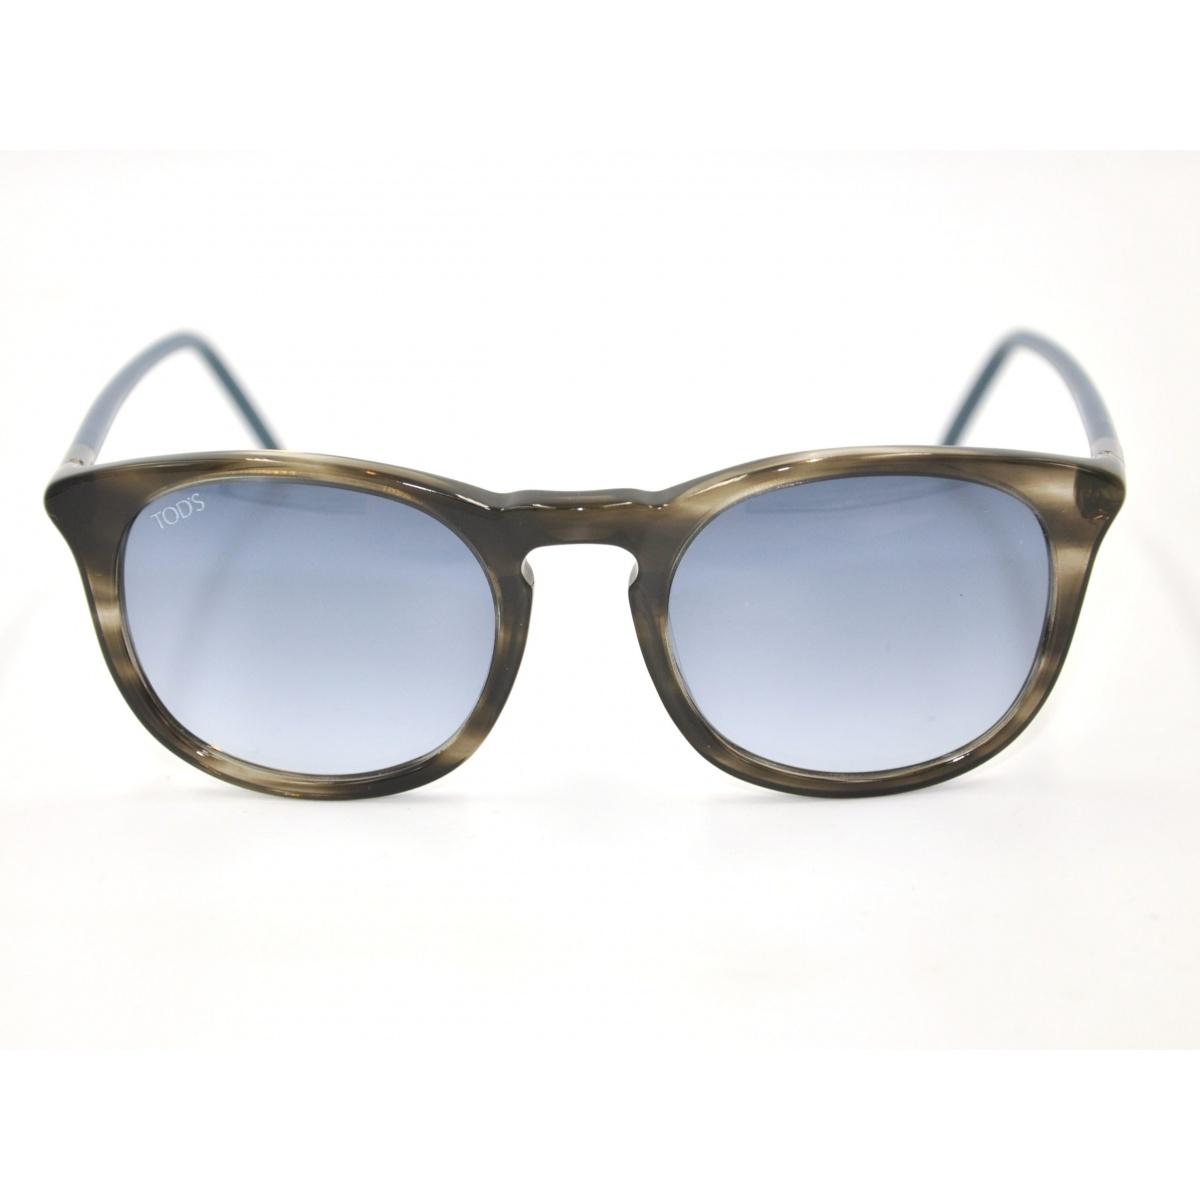 TODS TO122 20B UNISEX Sunglasses Piraeus